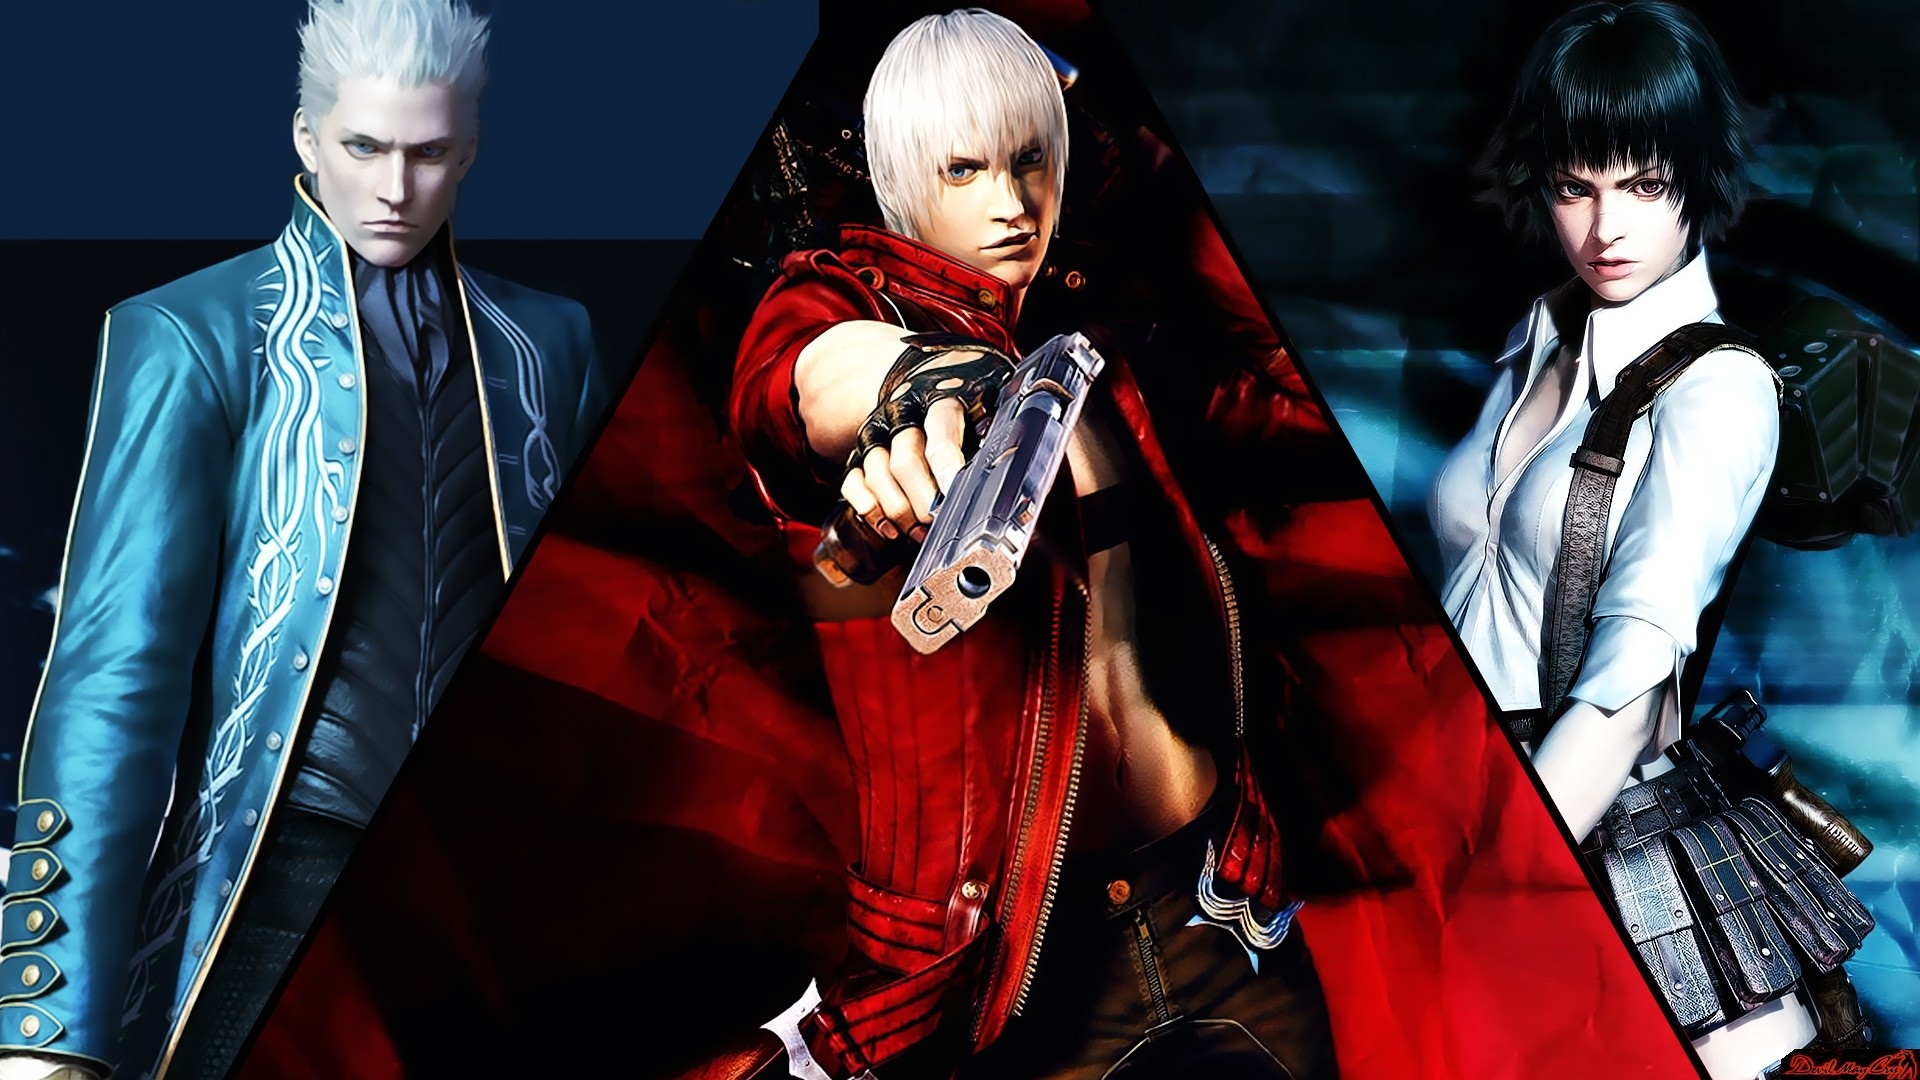 Devil May Cry 3 Dante S Awakening Hd Wallpaper Background